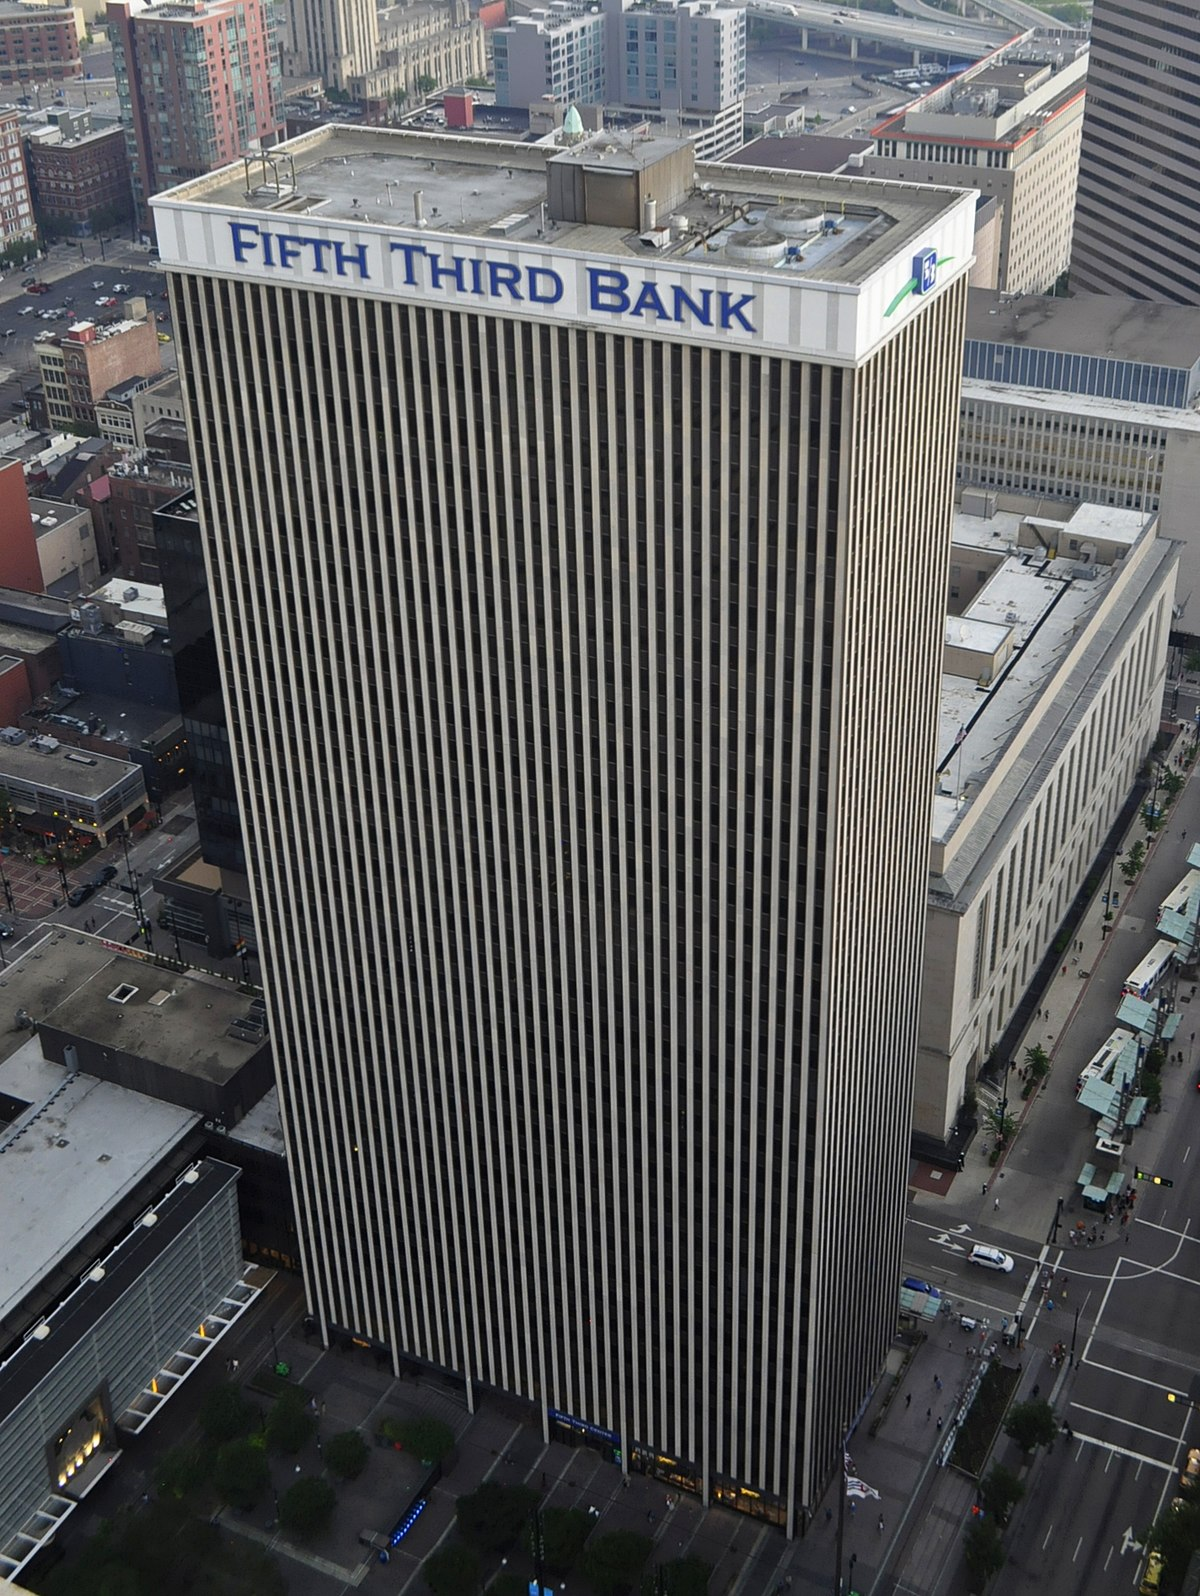 Fifth Third Bank Wikipedia